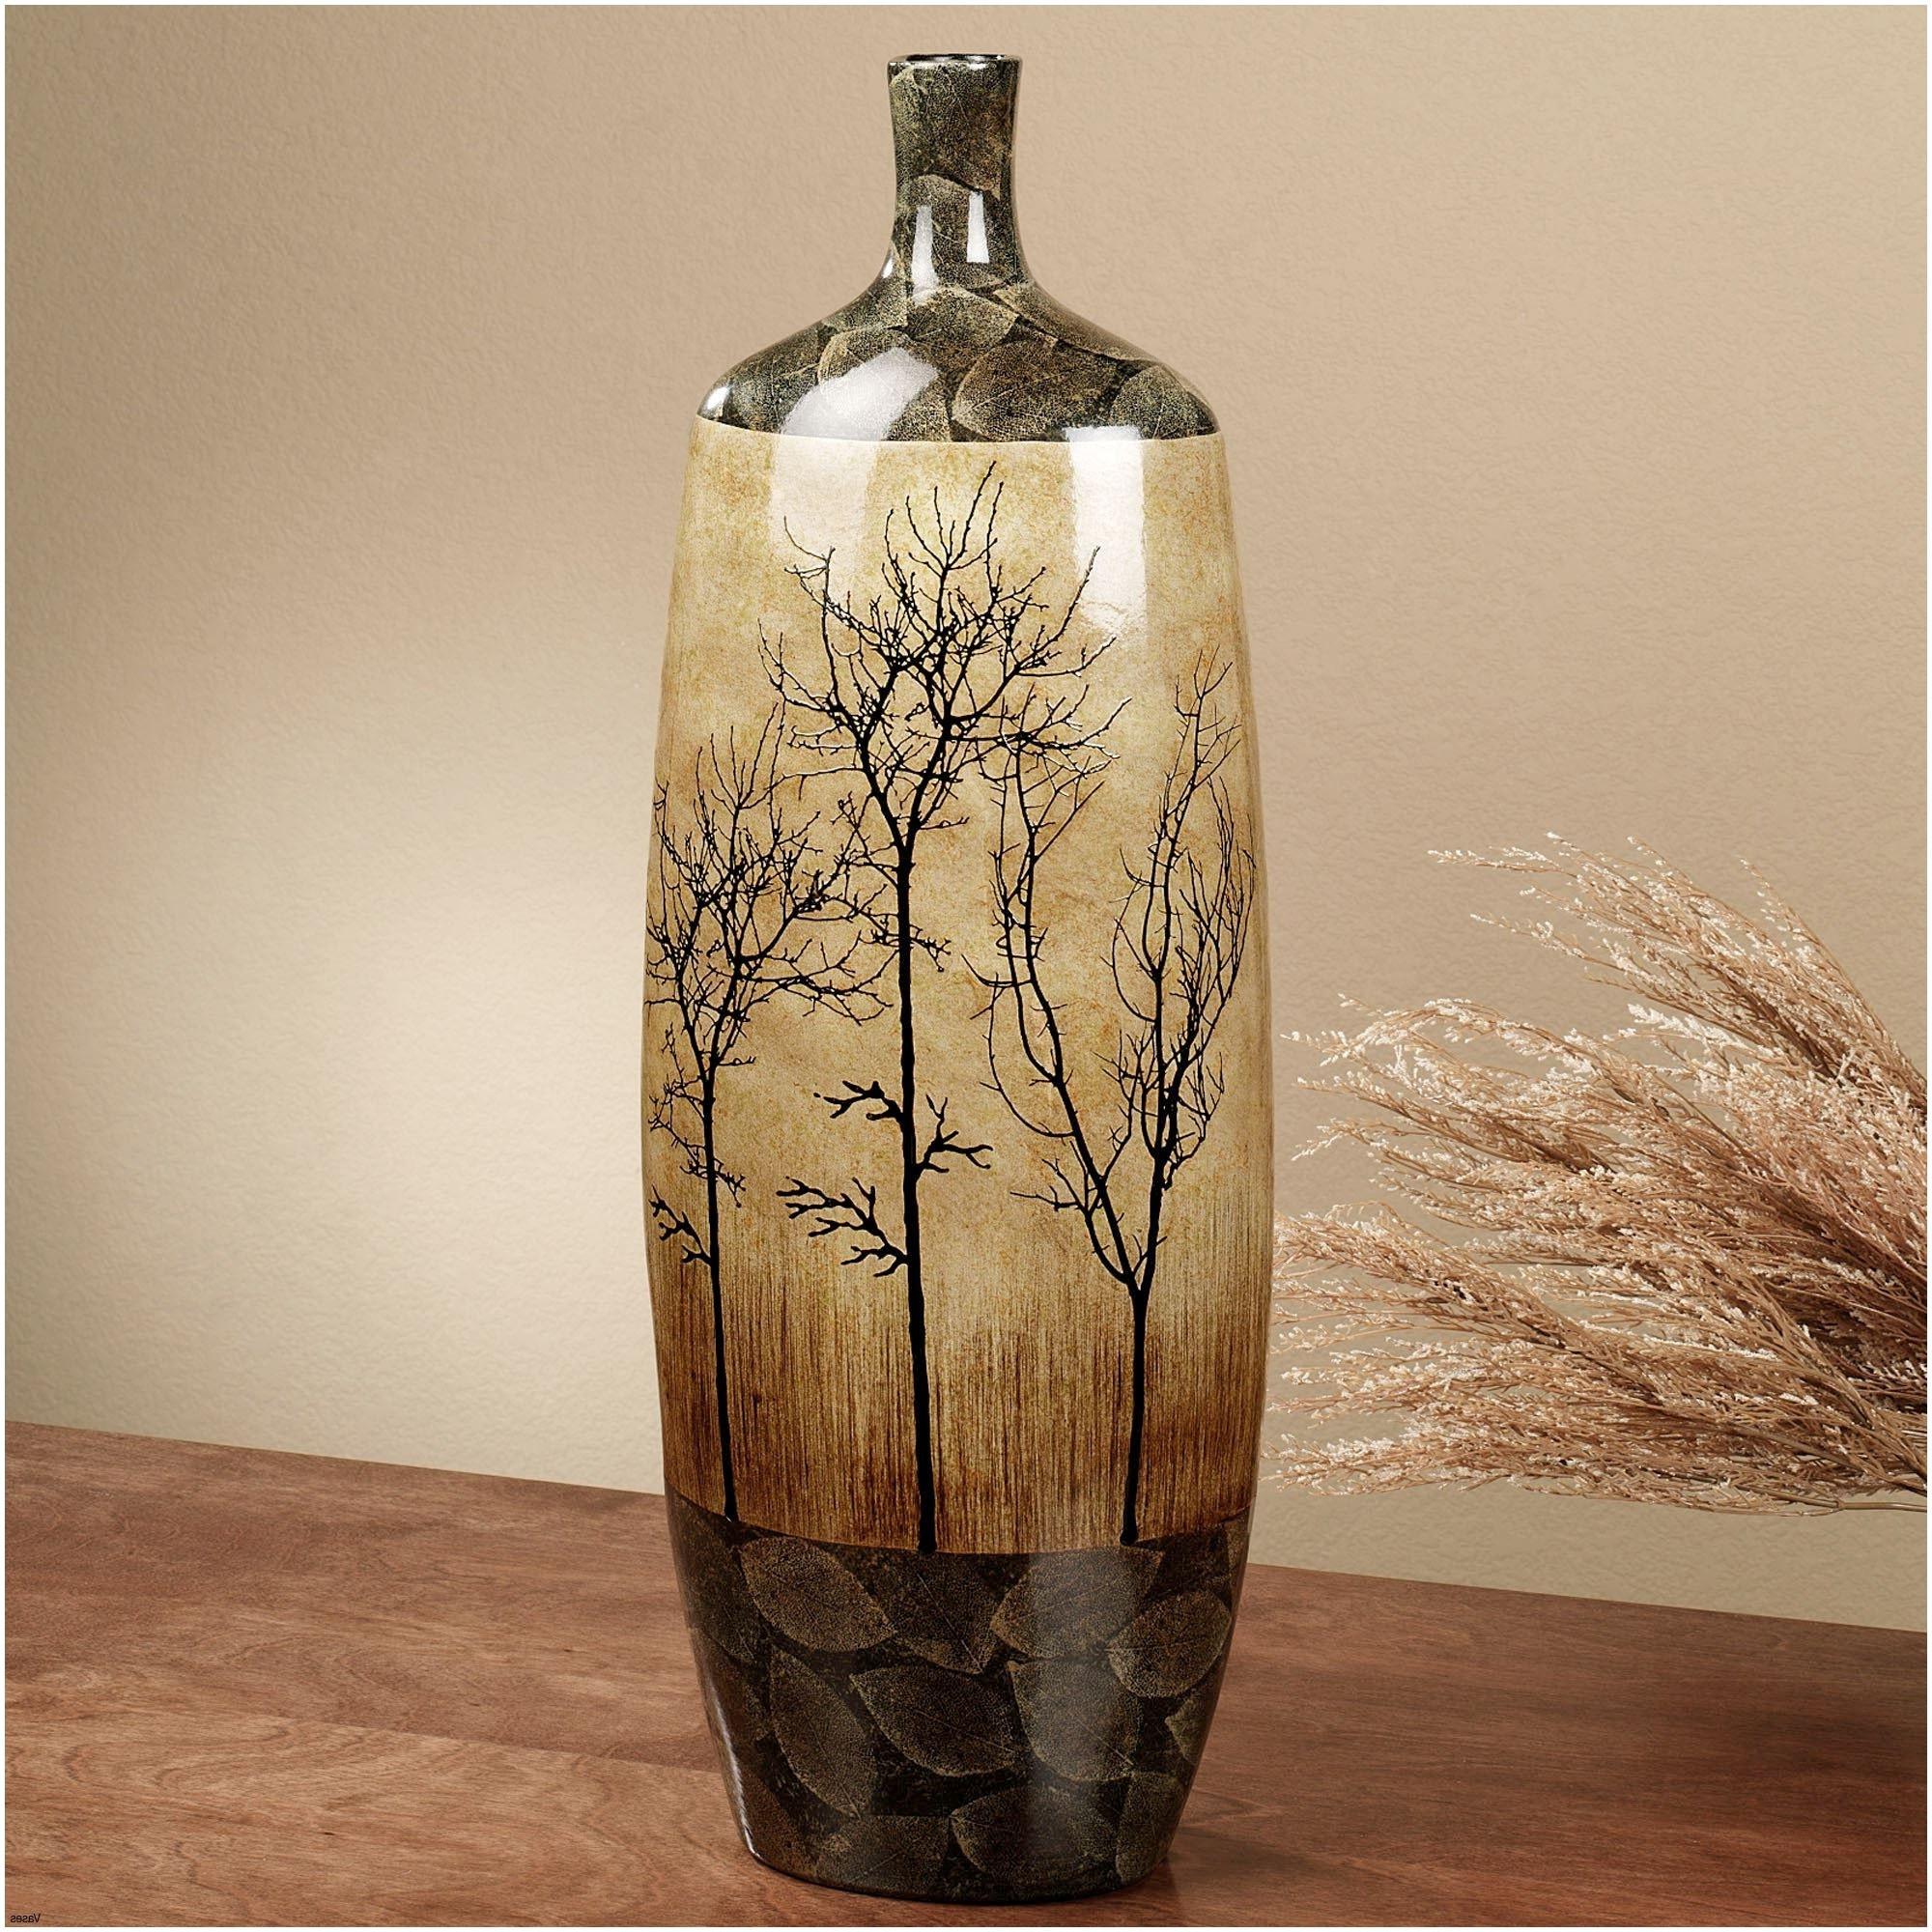 decorative twigs for vases of 21 beau decorative vases anciendemutu org with c145 001h vases ceramic decorative to expandi 0d